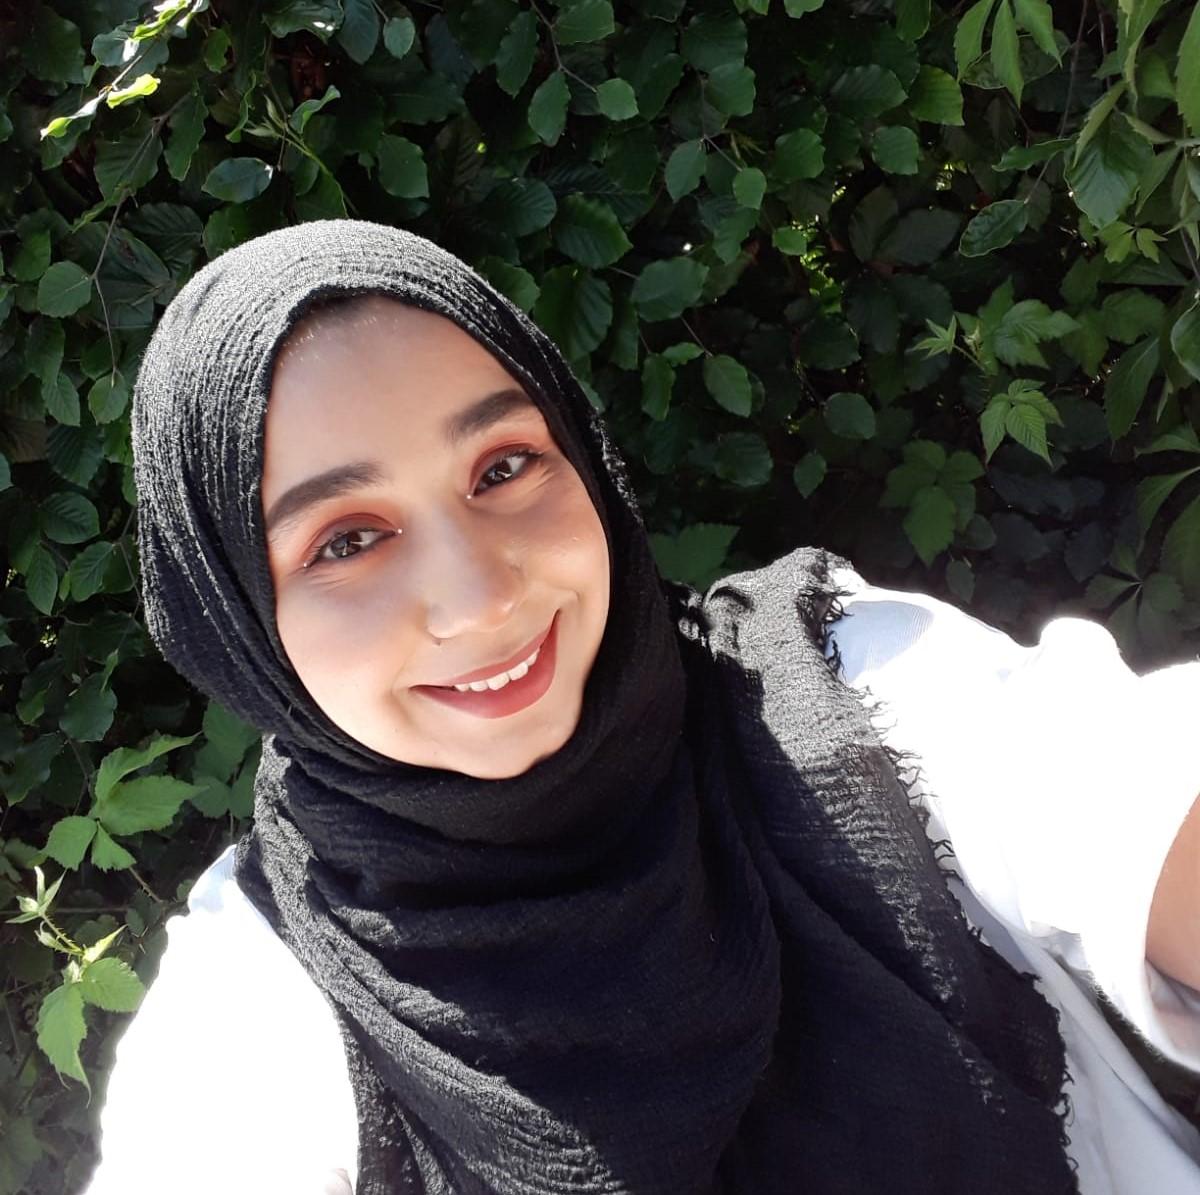 Salma kassamedewerker Muiderslot